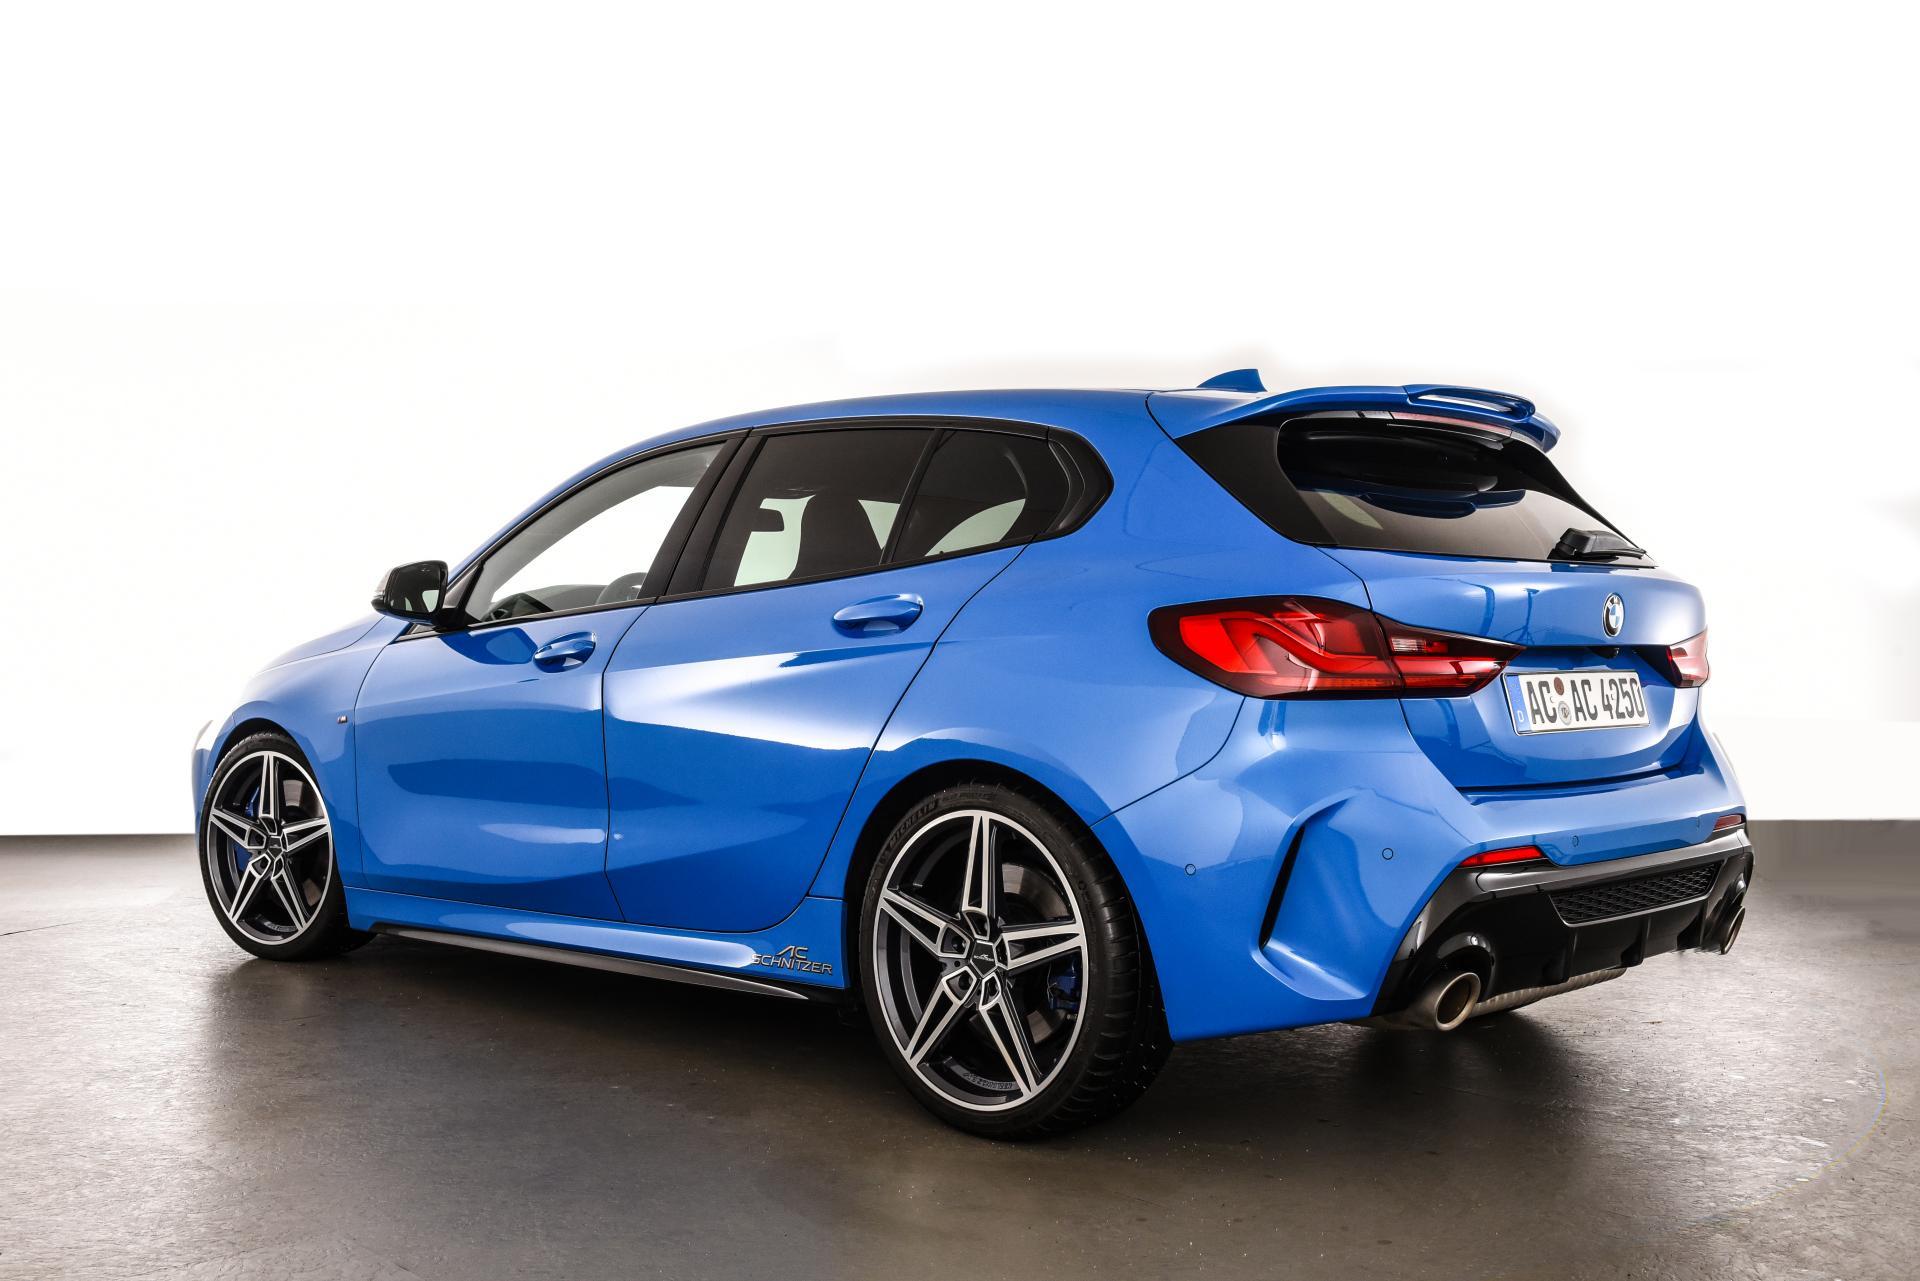 BMW-1-Series-M135i-by-AC-Schnitzer-8